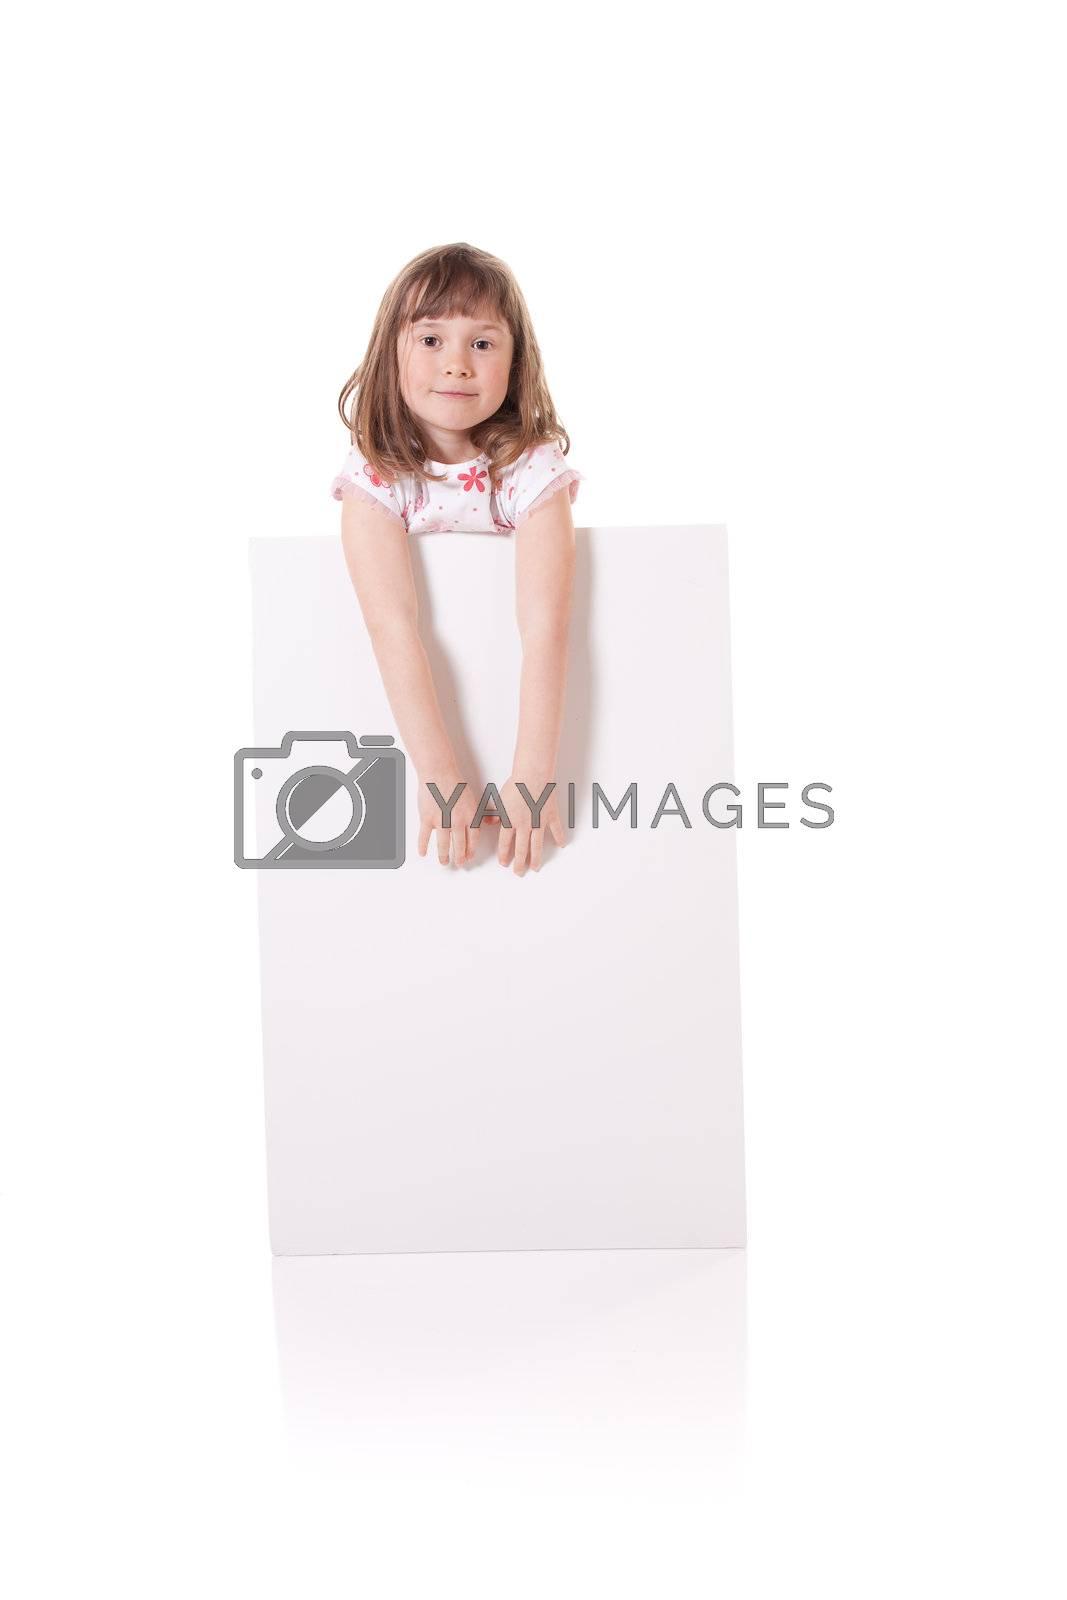 Cute little girl holding a blank cardboard sign